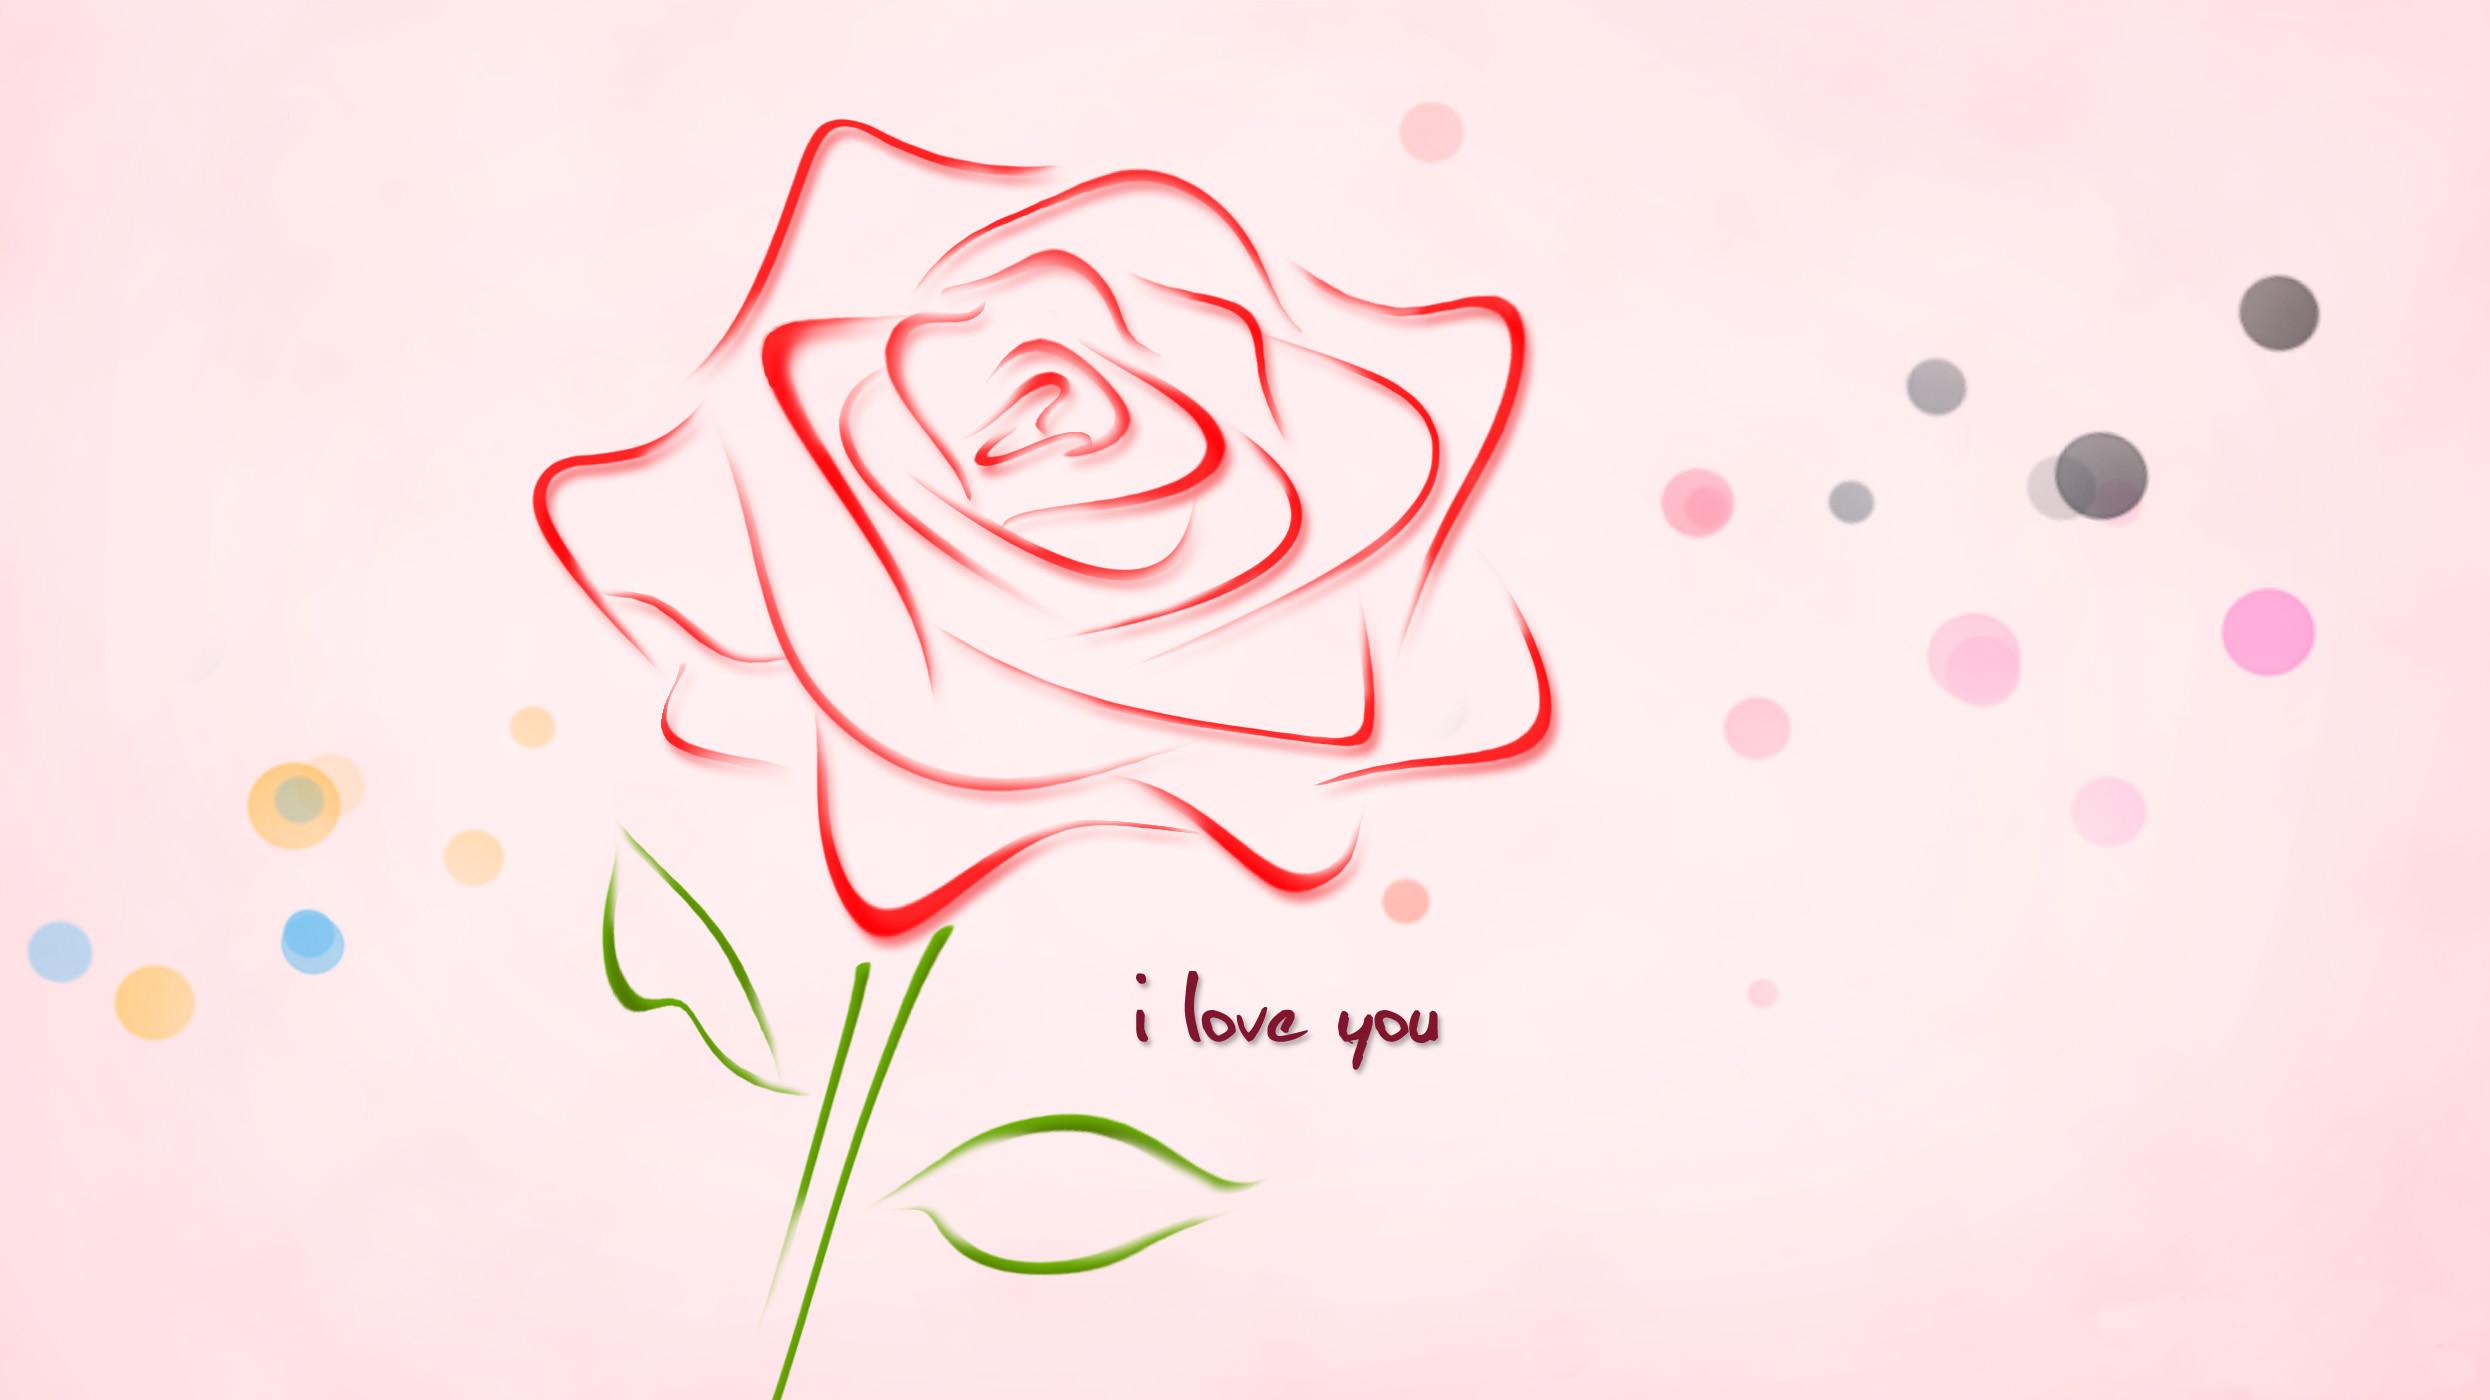 wallpaper download free love you